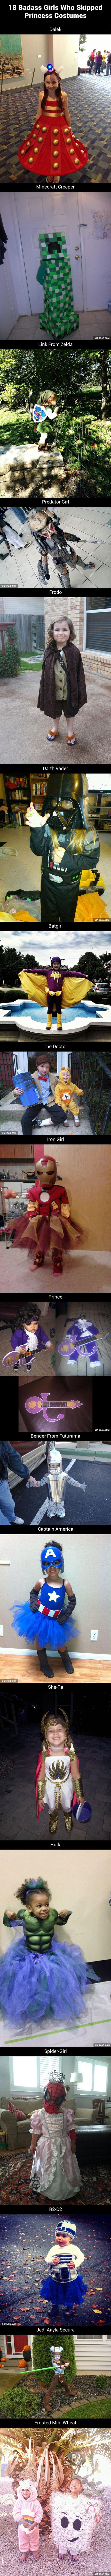 18 Badass Girls Who Skipped Princess Costumes